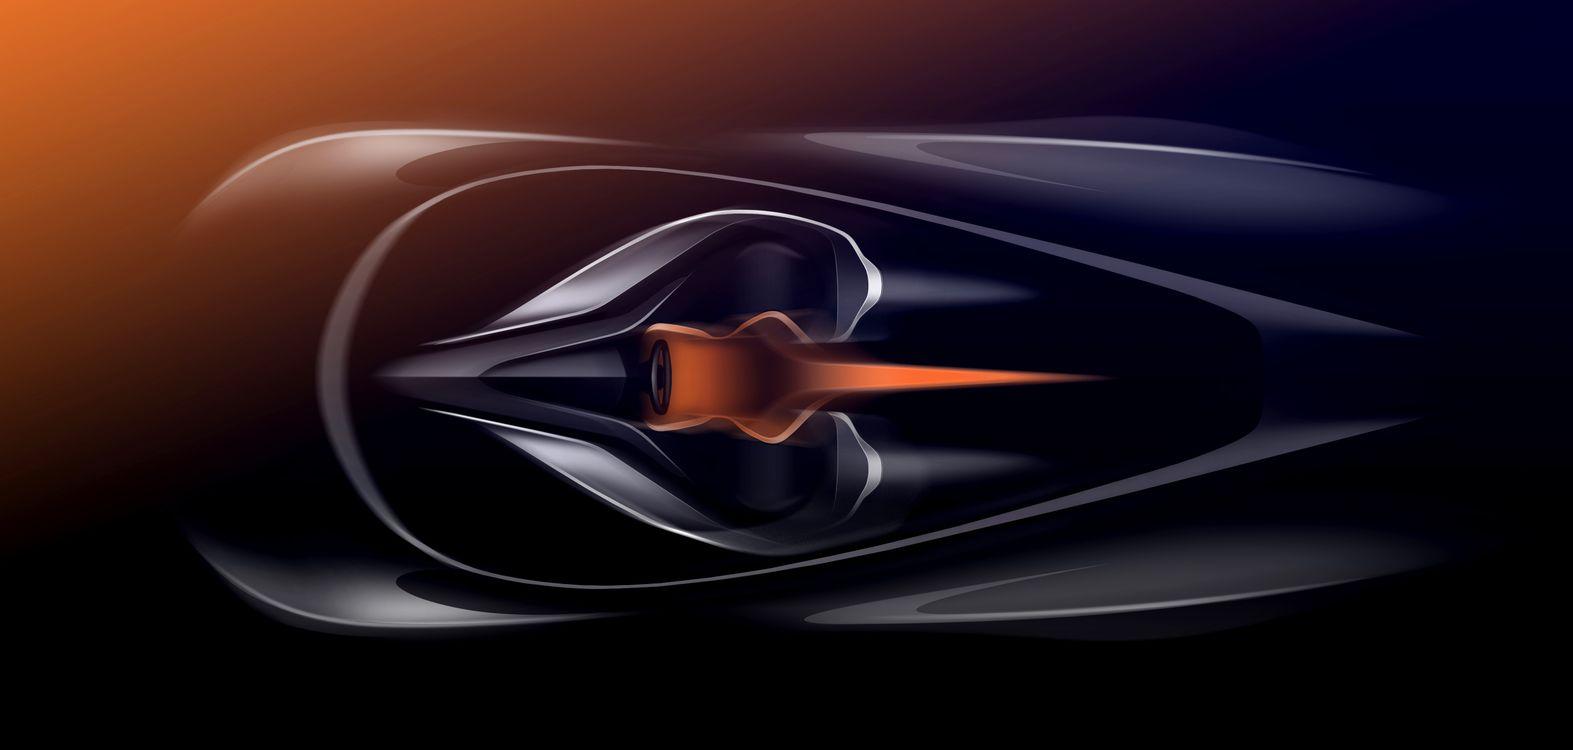 Обои Mclaren, 2018 Cars, Cars картинки на телефон